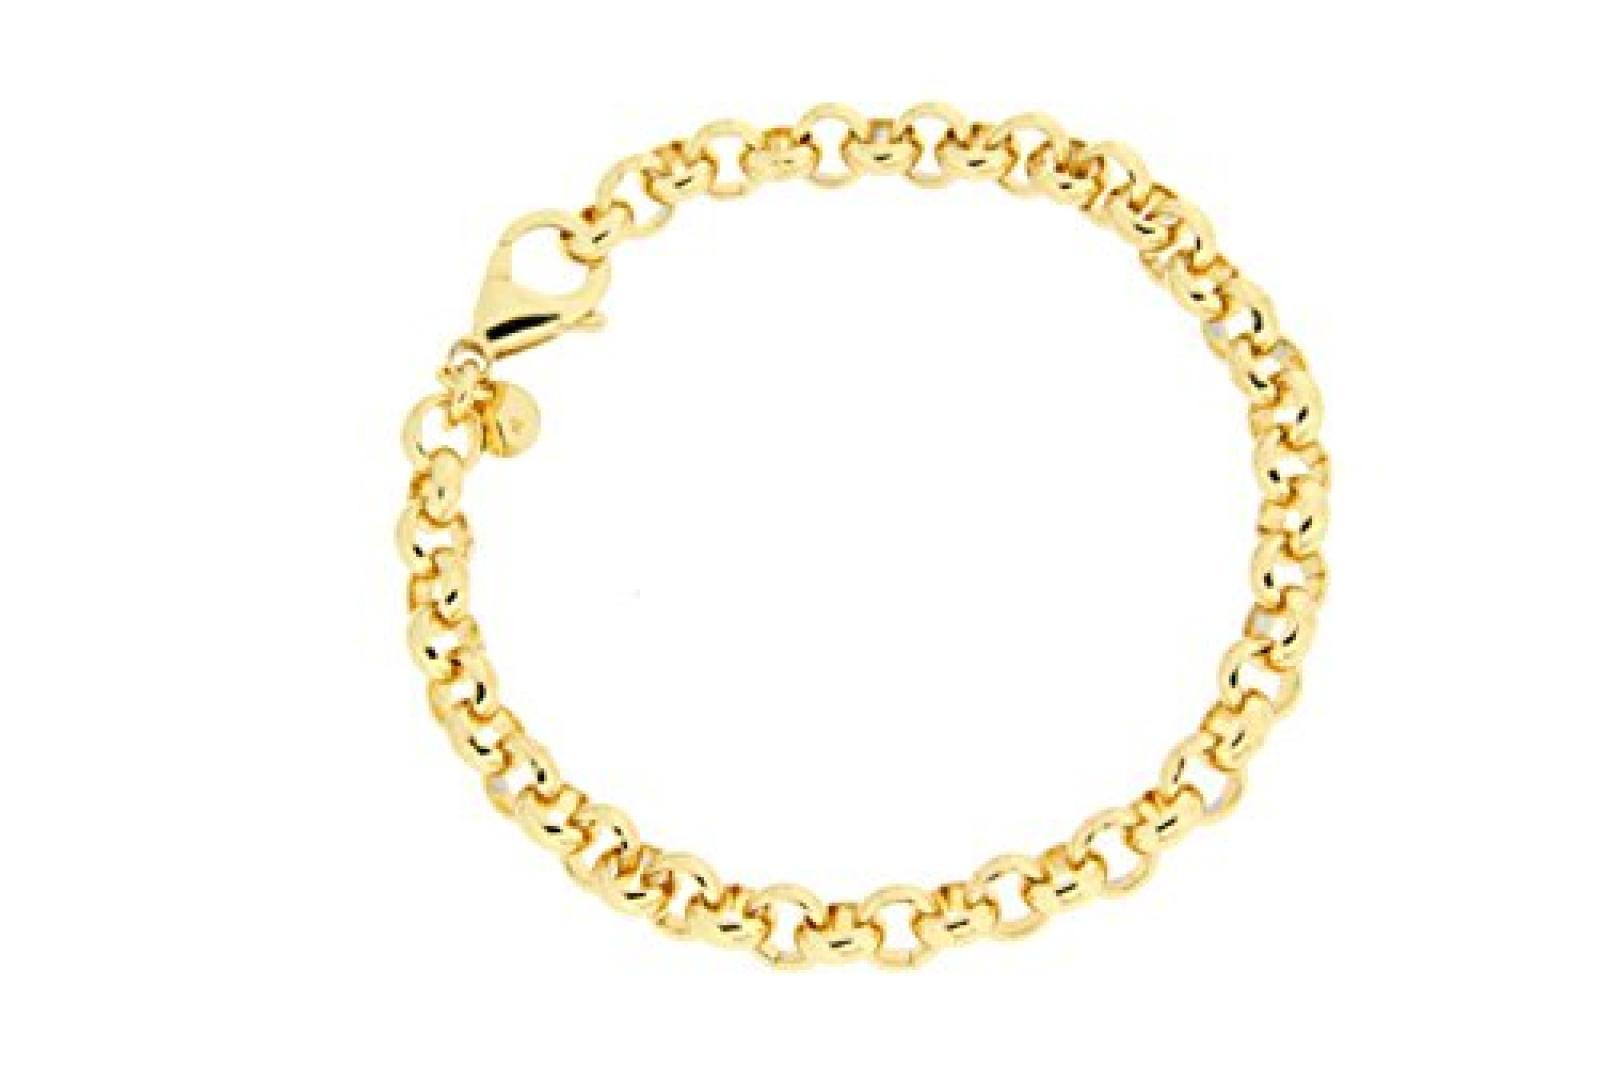 Kettenworld Damen Armband Bronze 21 cm 253434